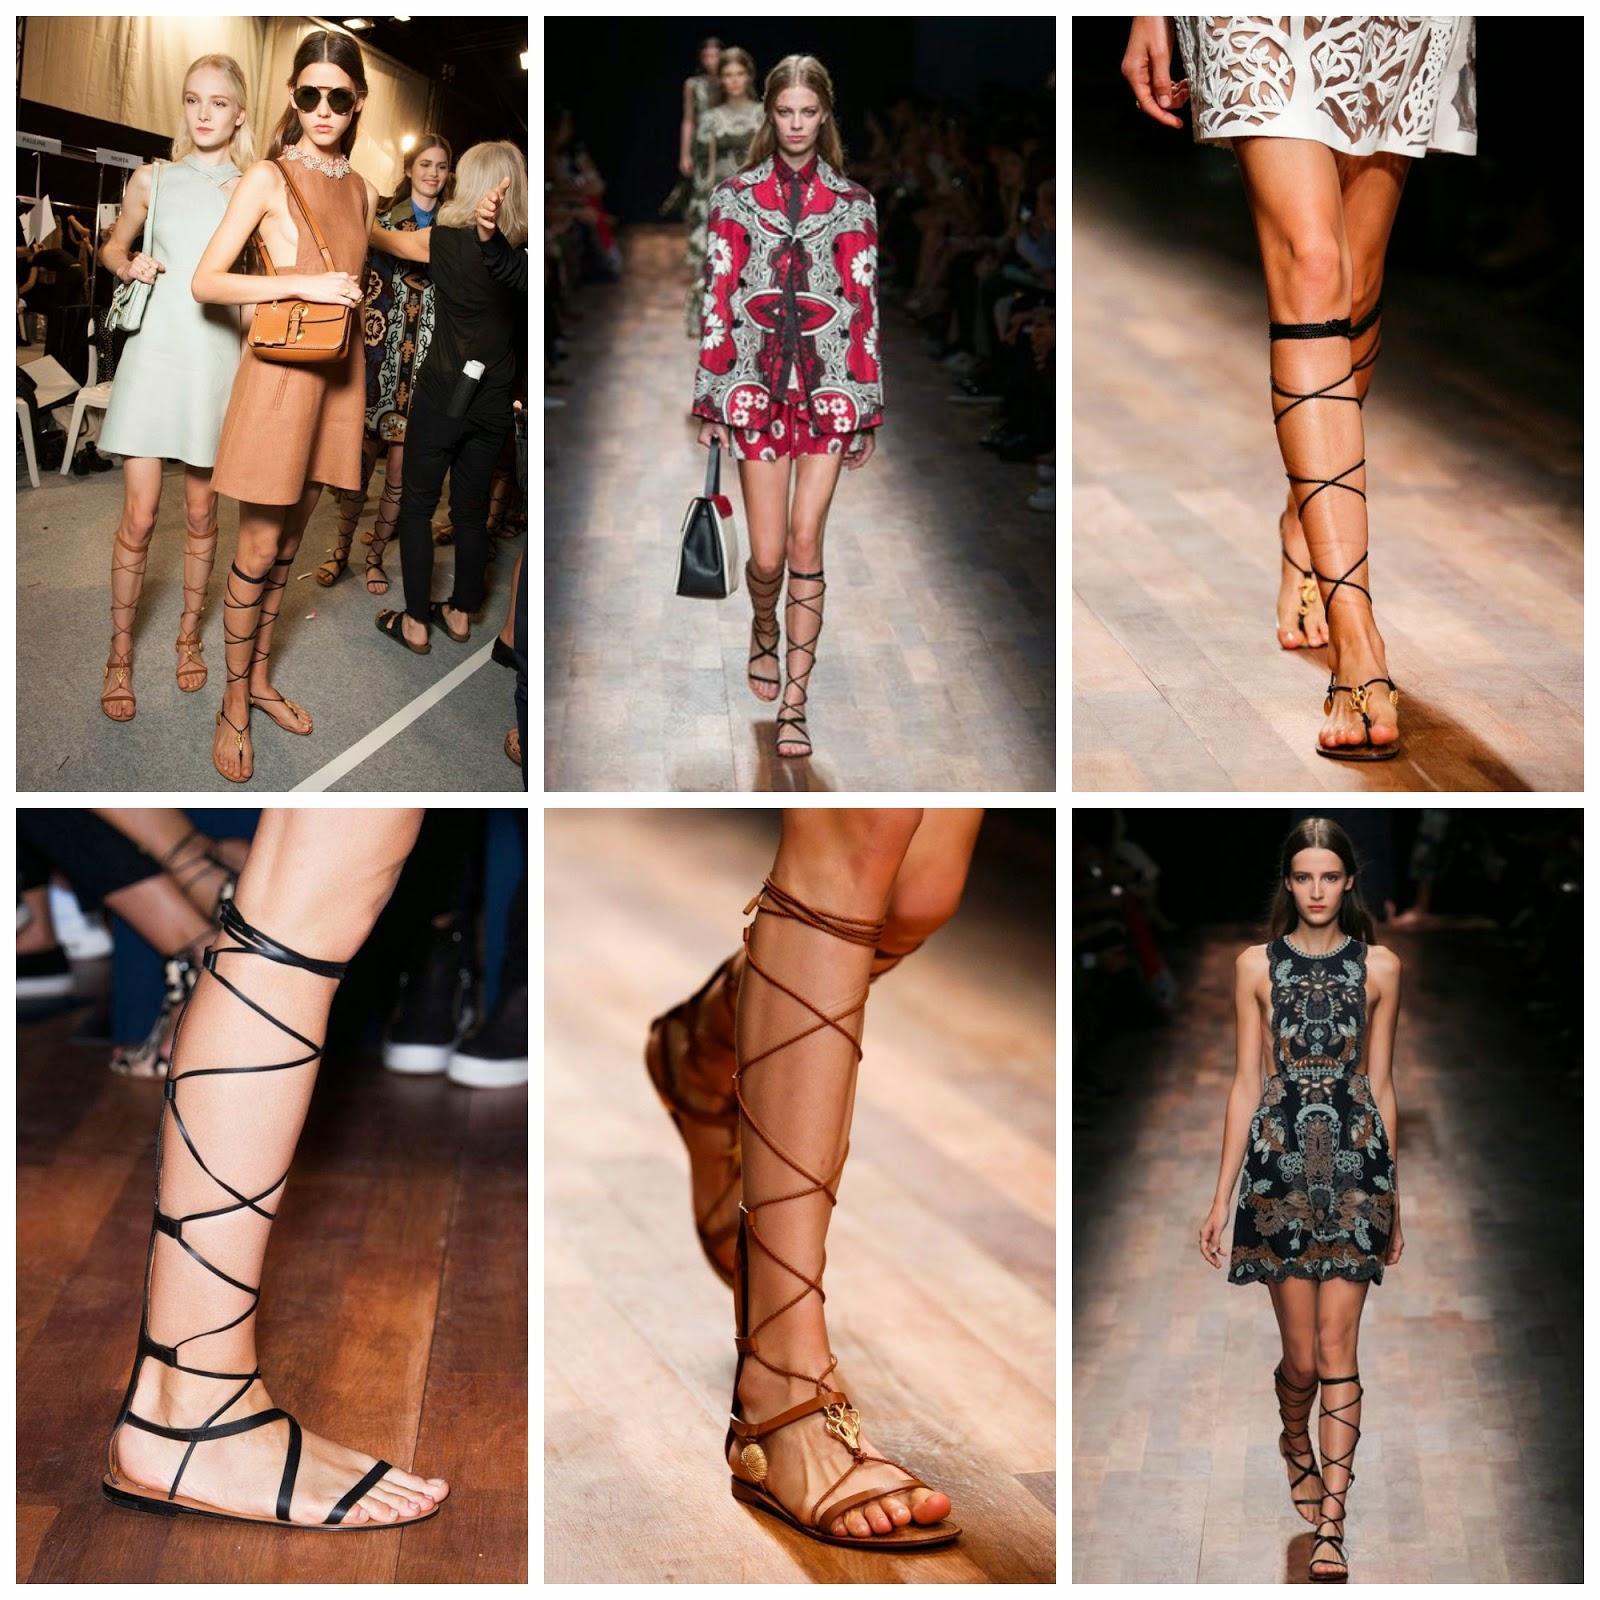 Sandalias romanas Valentino. Todos los clones de las sandalias romanas de Valentino. Sandalias romanas altas. Sandalias romanas comprar. Sandalias romanas Marypaz precio. Sandalias romanas primavera verano 2015